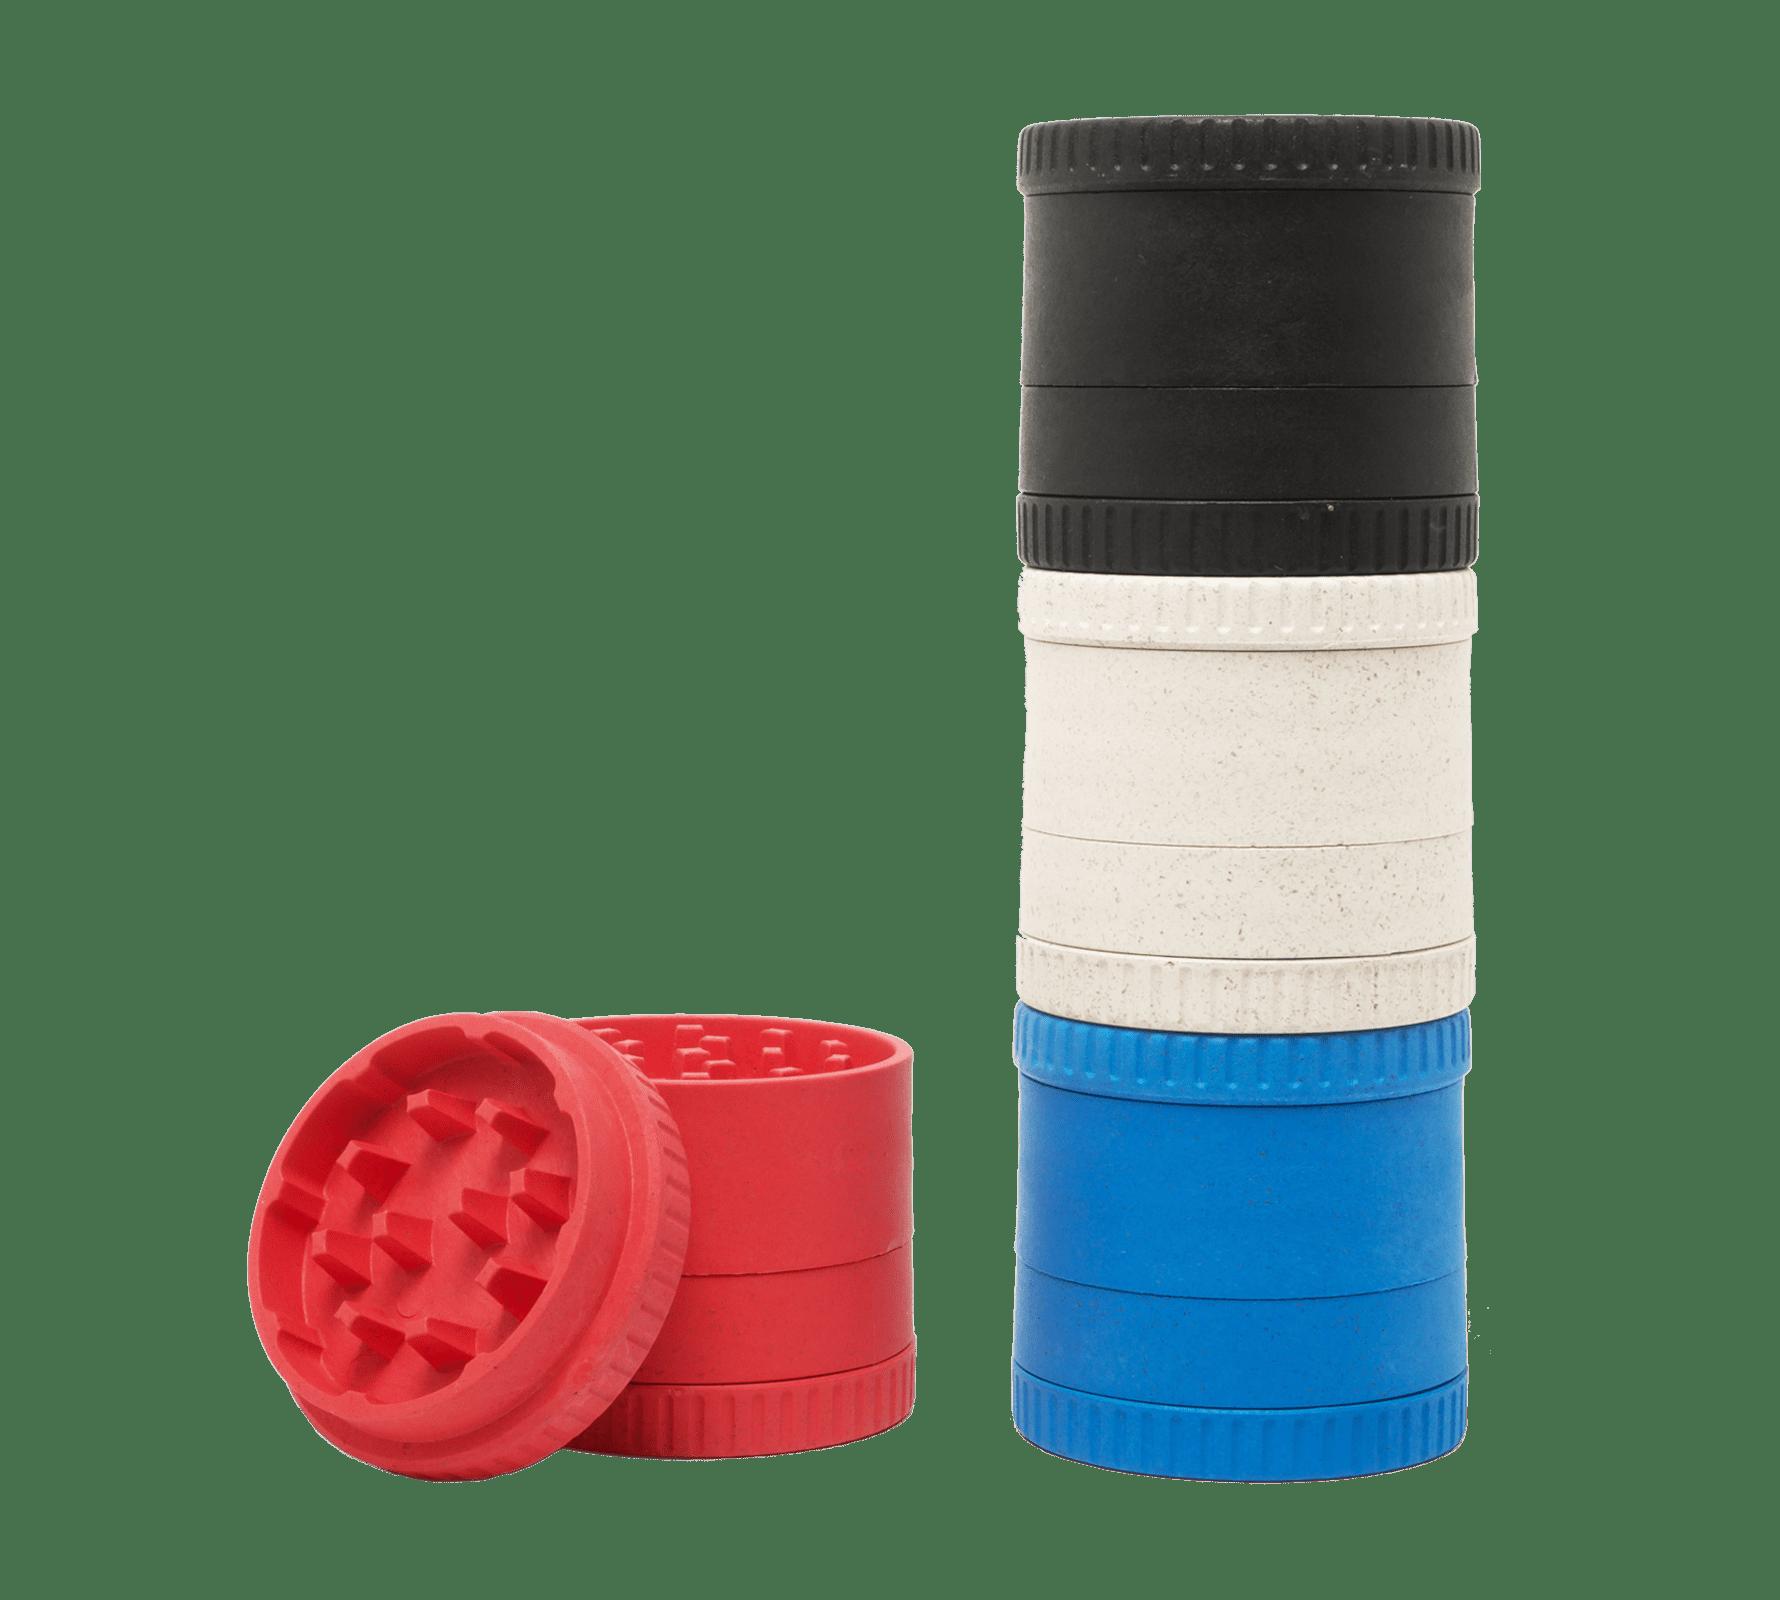 Tom Hemps Product Santa Cruz Grindr 4 Piece Color (1)